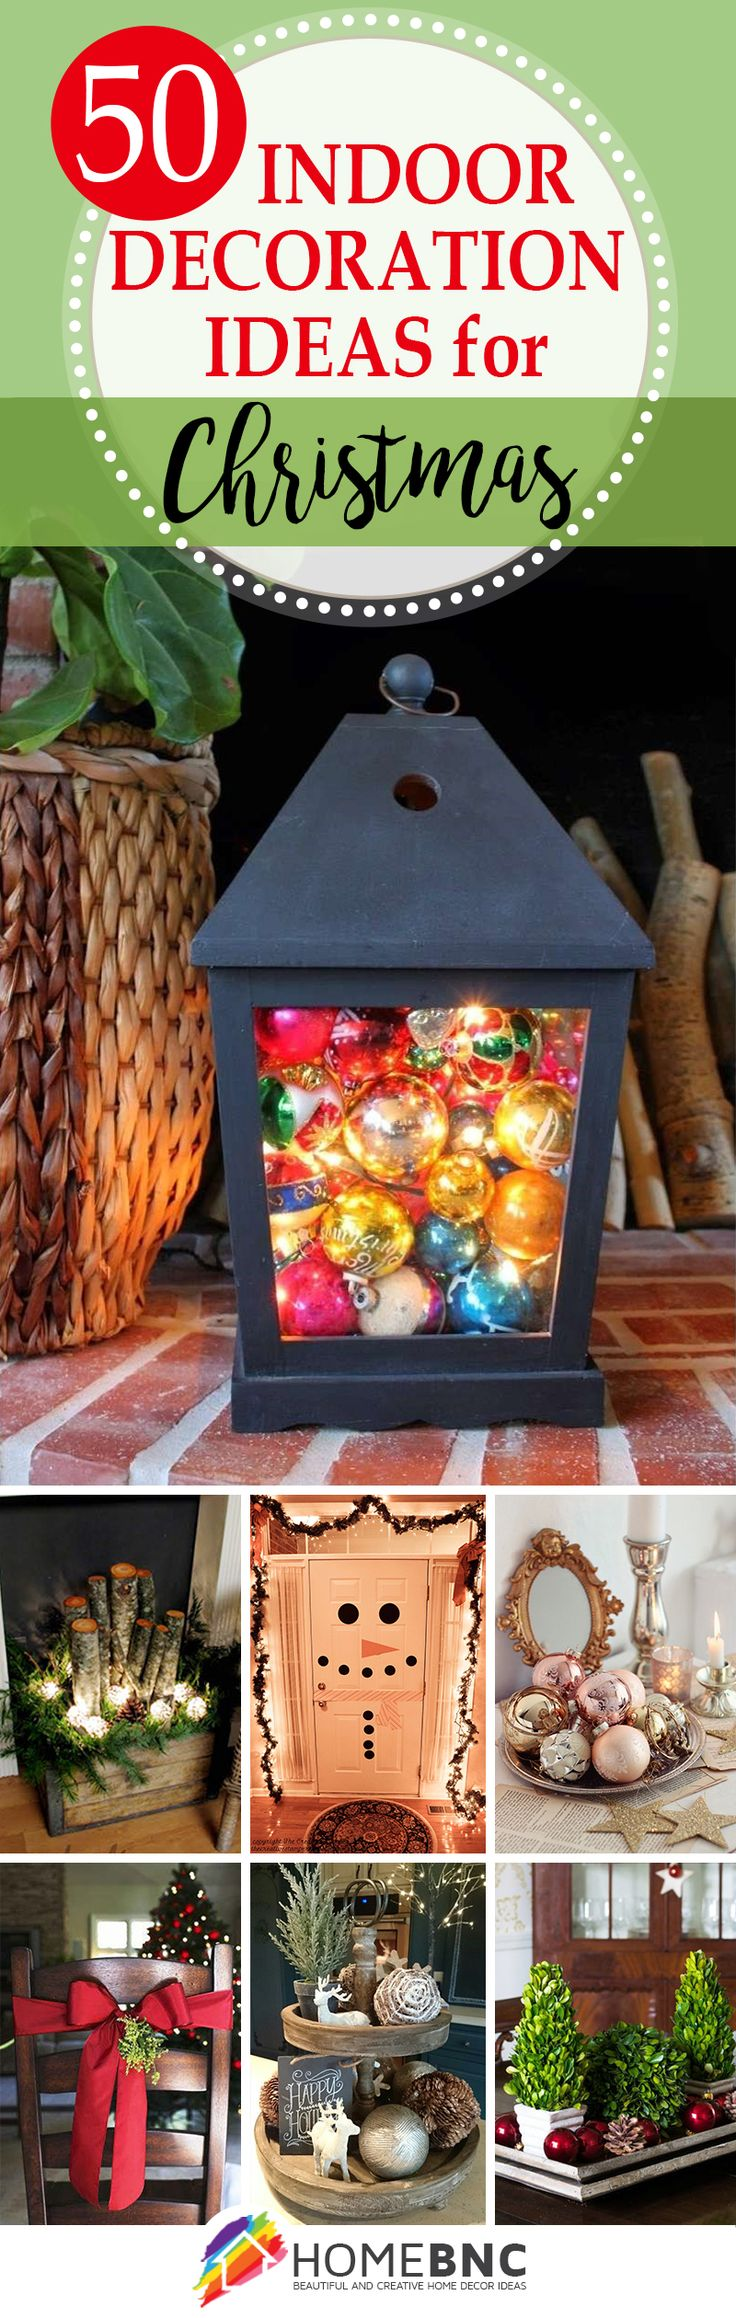 best 25 indoor christmas decorations ideas only on pinterest diy xmas decorations diy. Black Bedroom Furniture Sets. Home Design Ideas